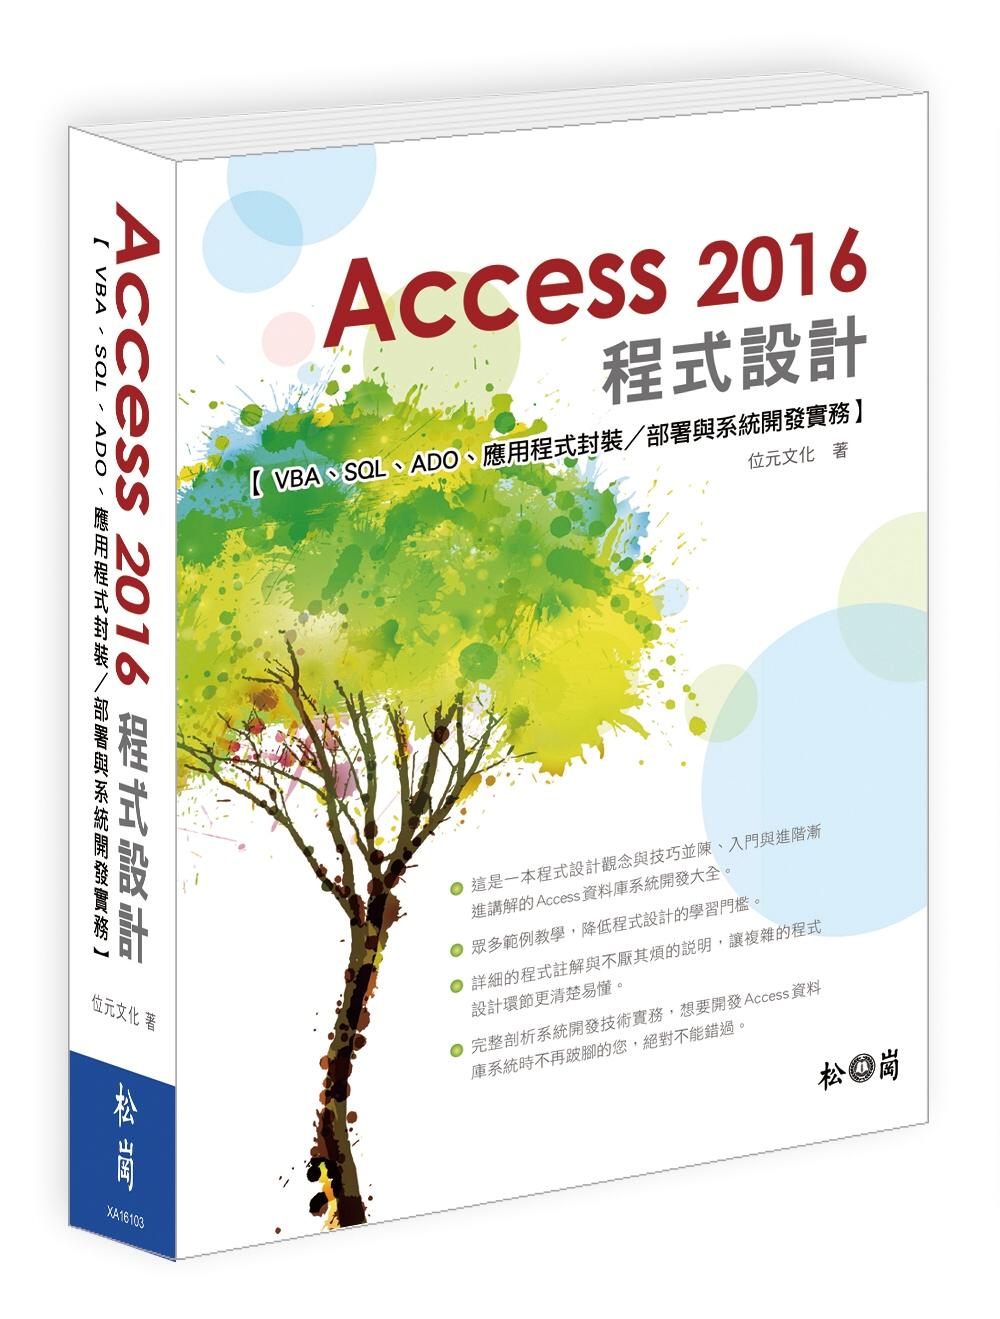 Access 2016程式設計:VBA、SQL、ADO應用程式封裝/部署與系統開發實務